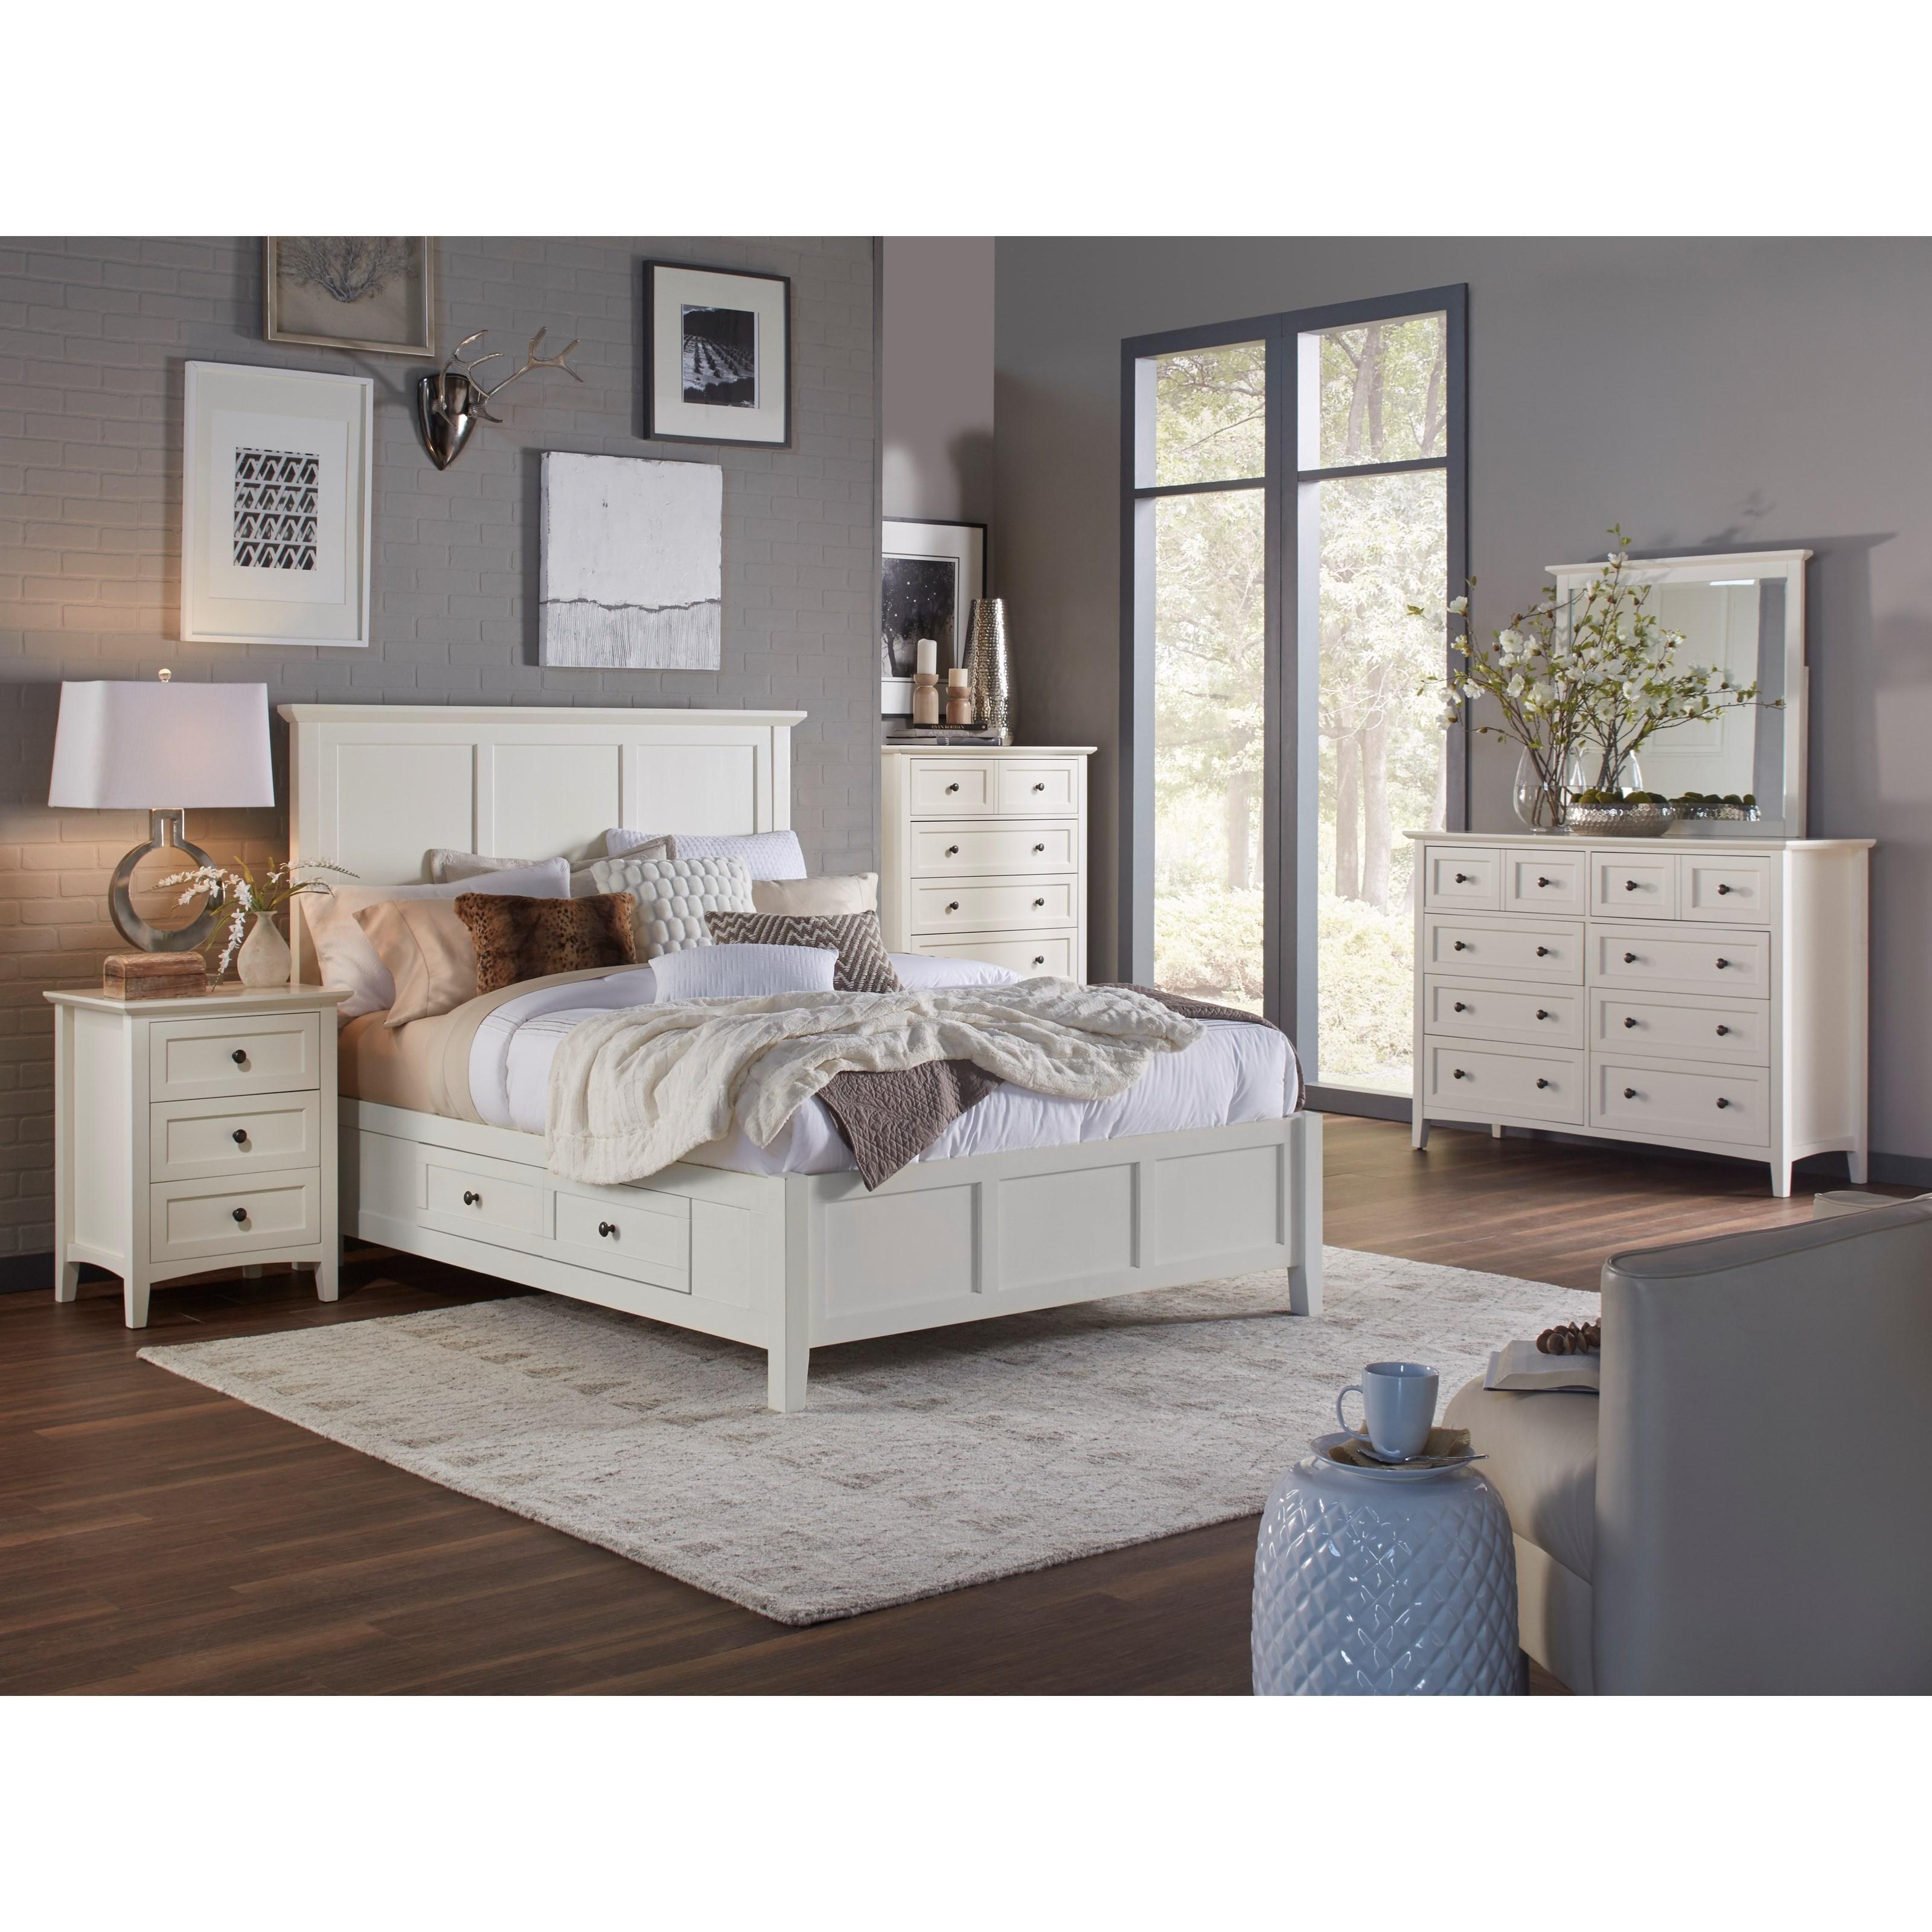 Calfiornia King Bedroom Group